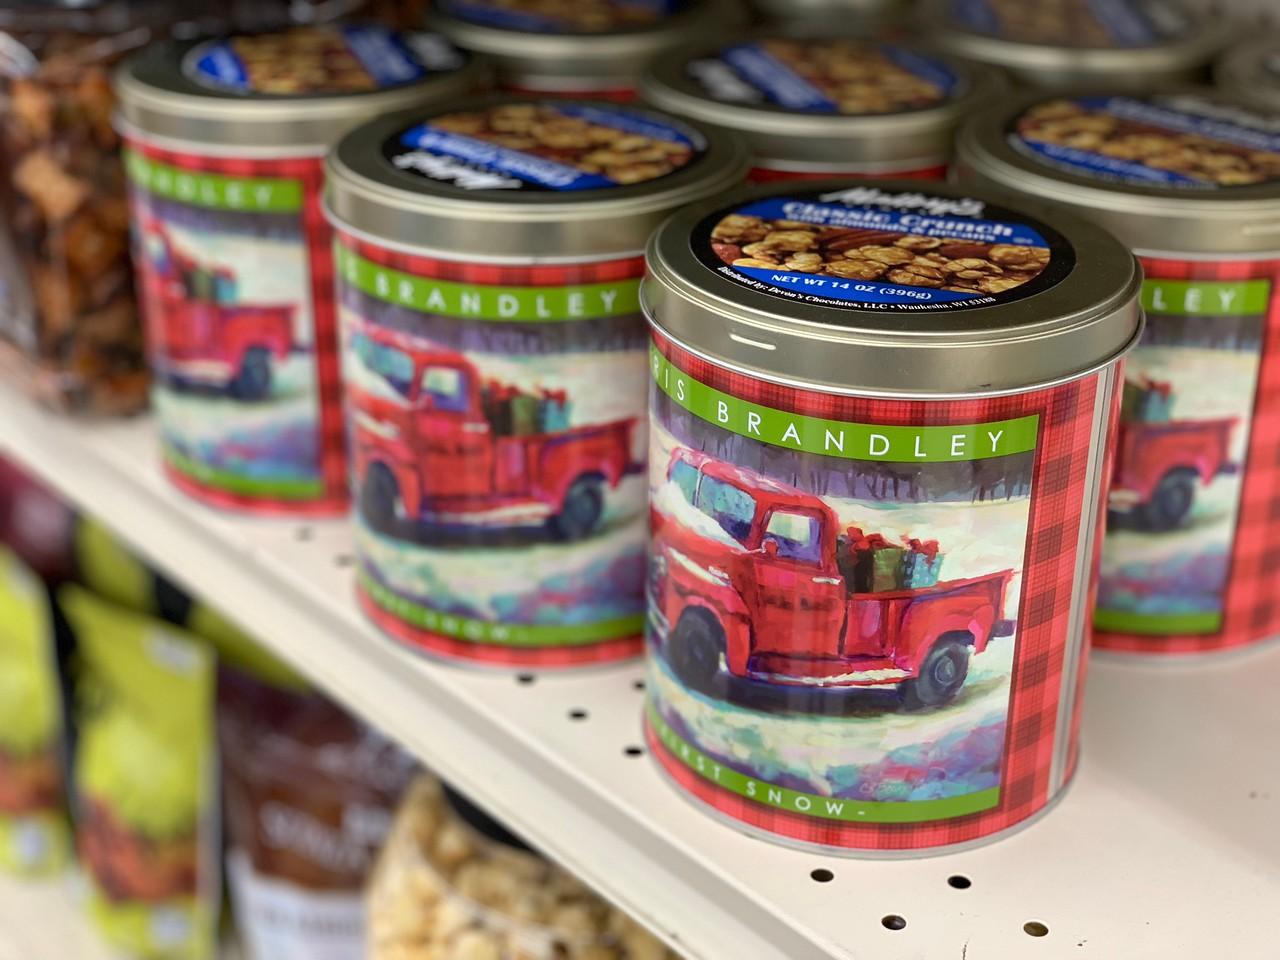 best big lots black friday deals 2018 – snacks in tins